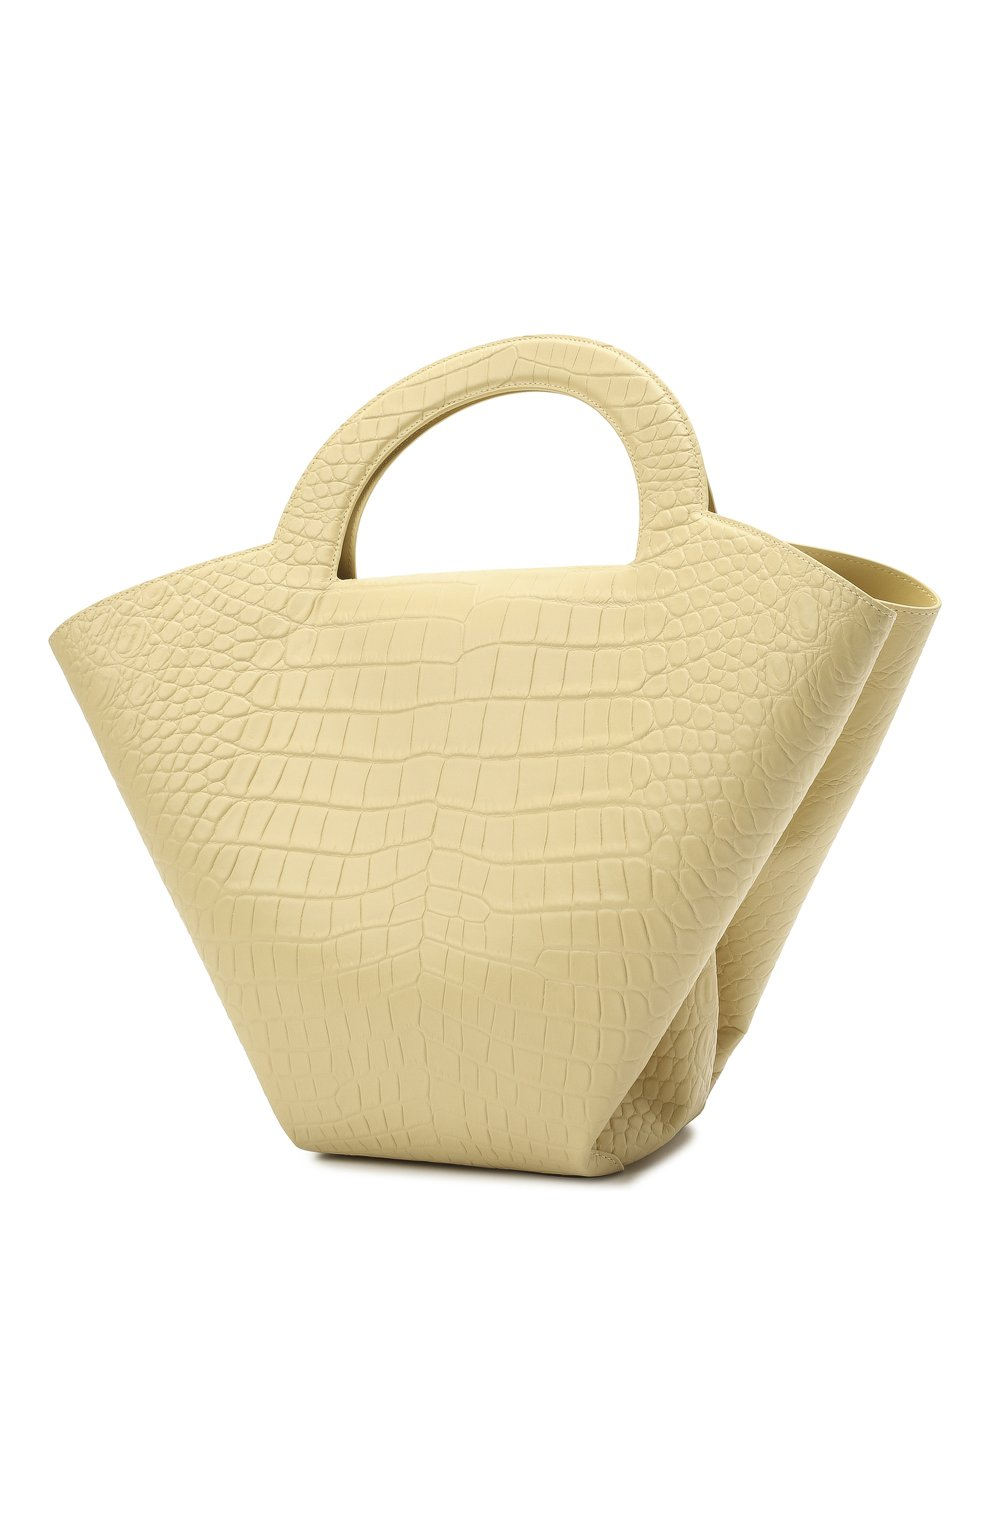 Женский сумка-тоут doll large BOTTEGA VENETA желтого цвета, арт. 658516/VA450 | Фото 3